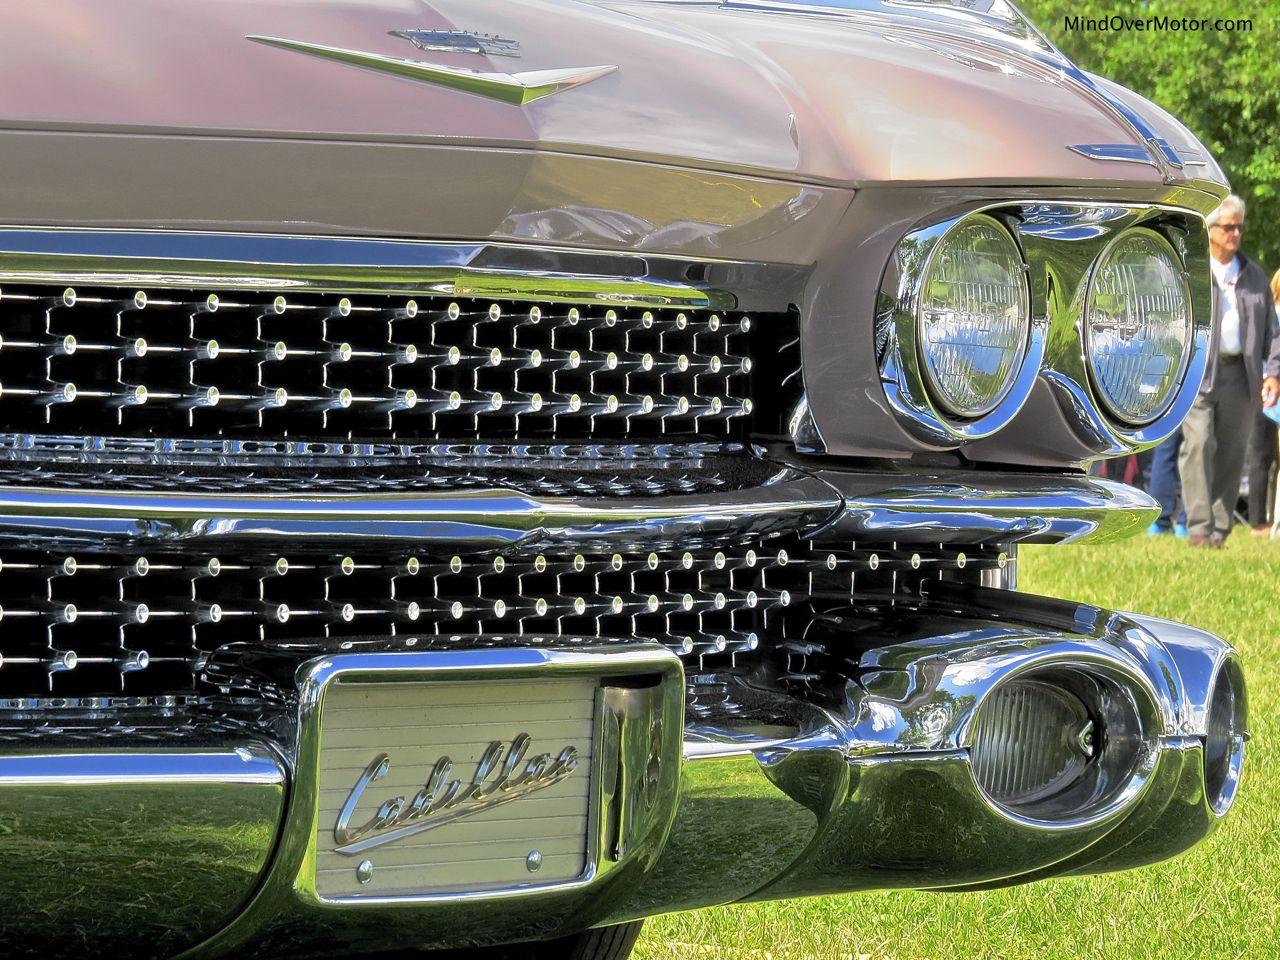 1959 Cadillac Coupe DeVille Grille Detail